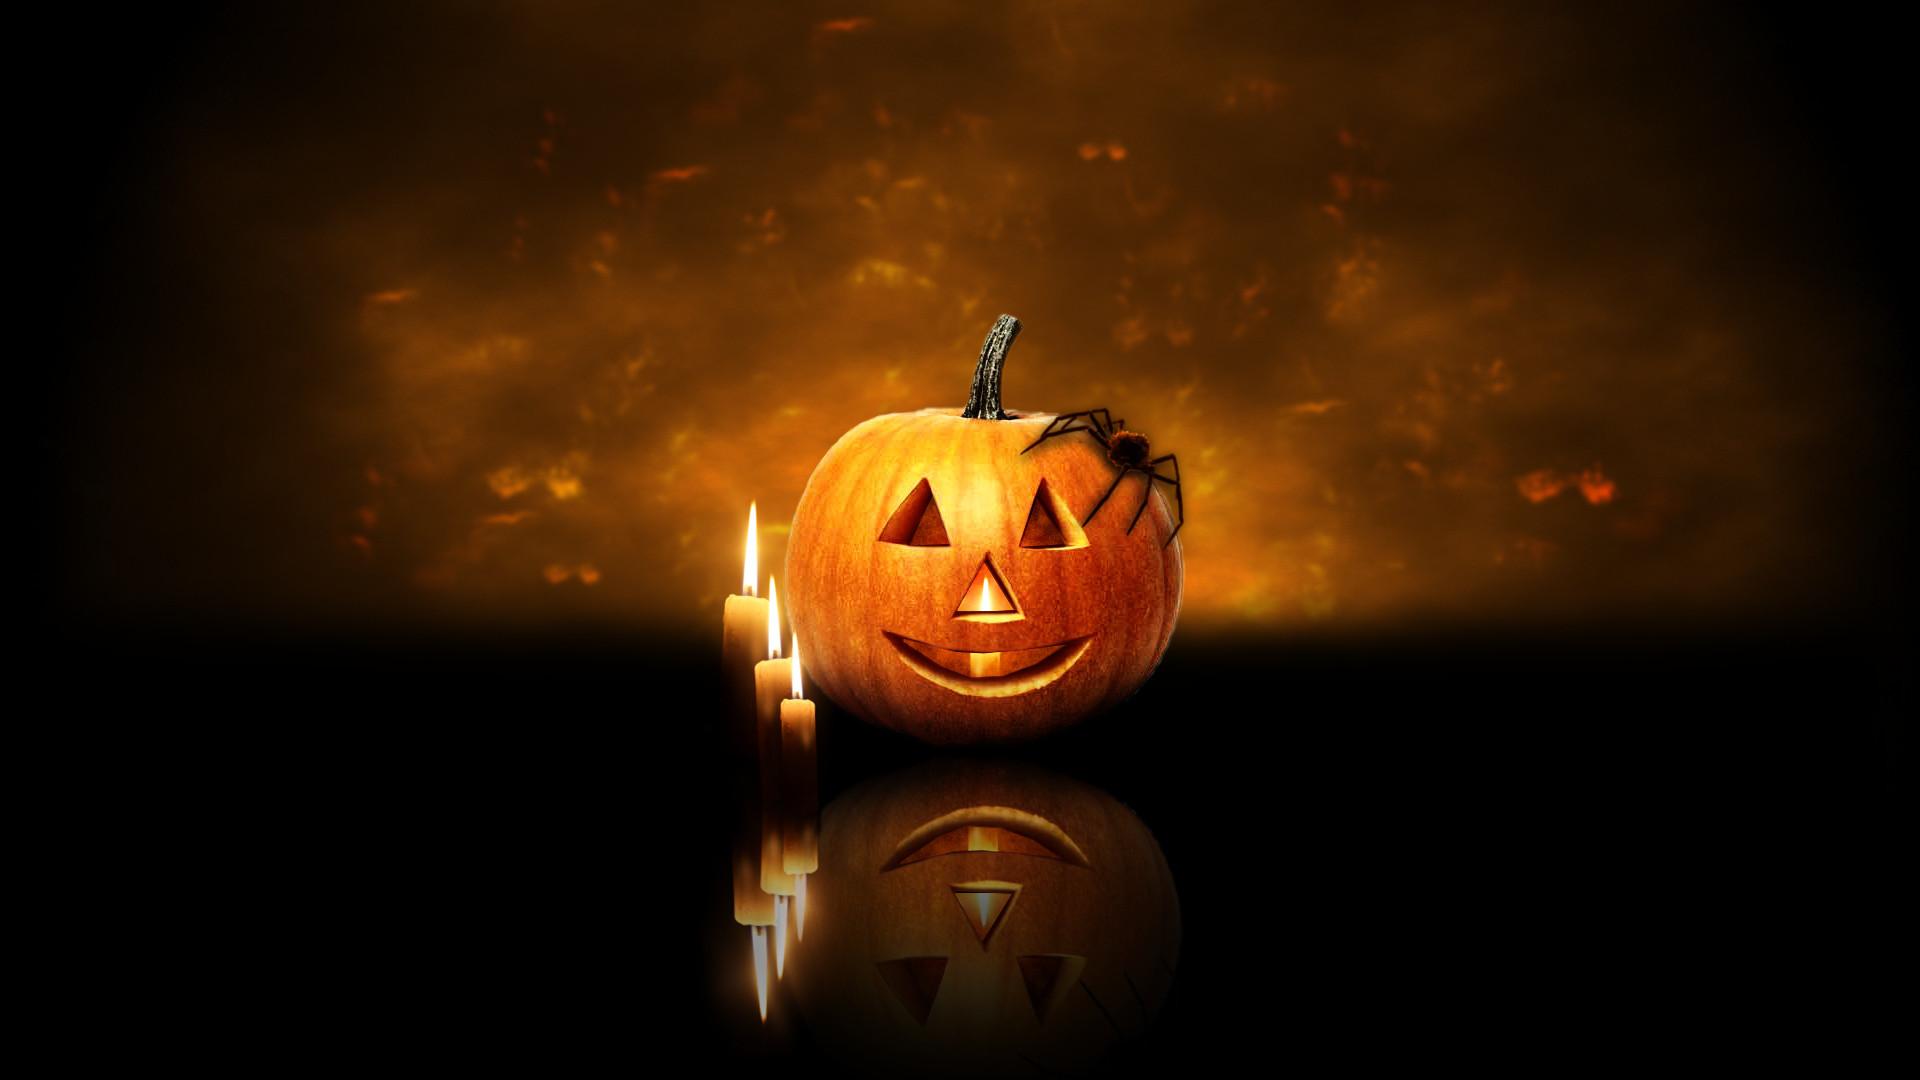 Cute Halloween Lantern Wallpaper